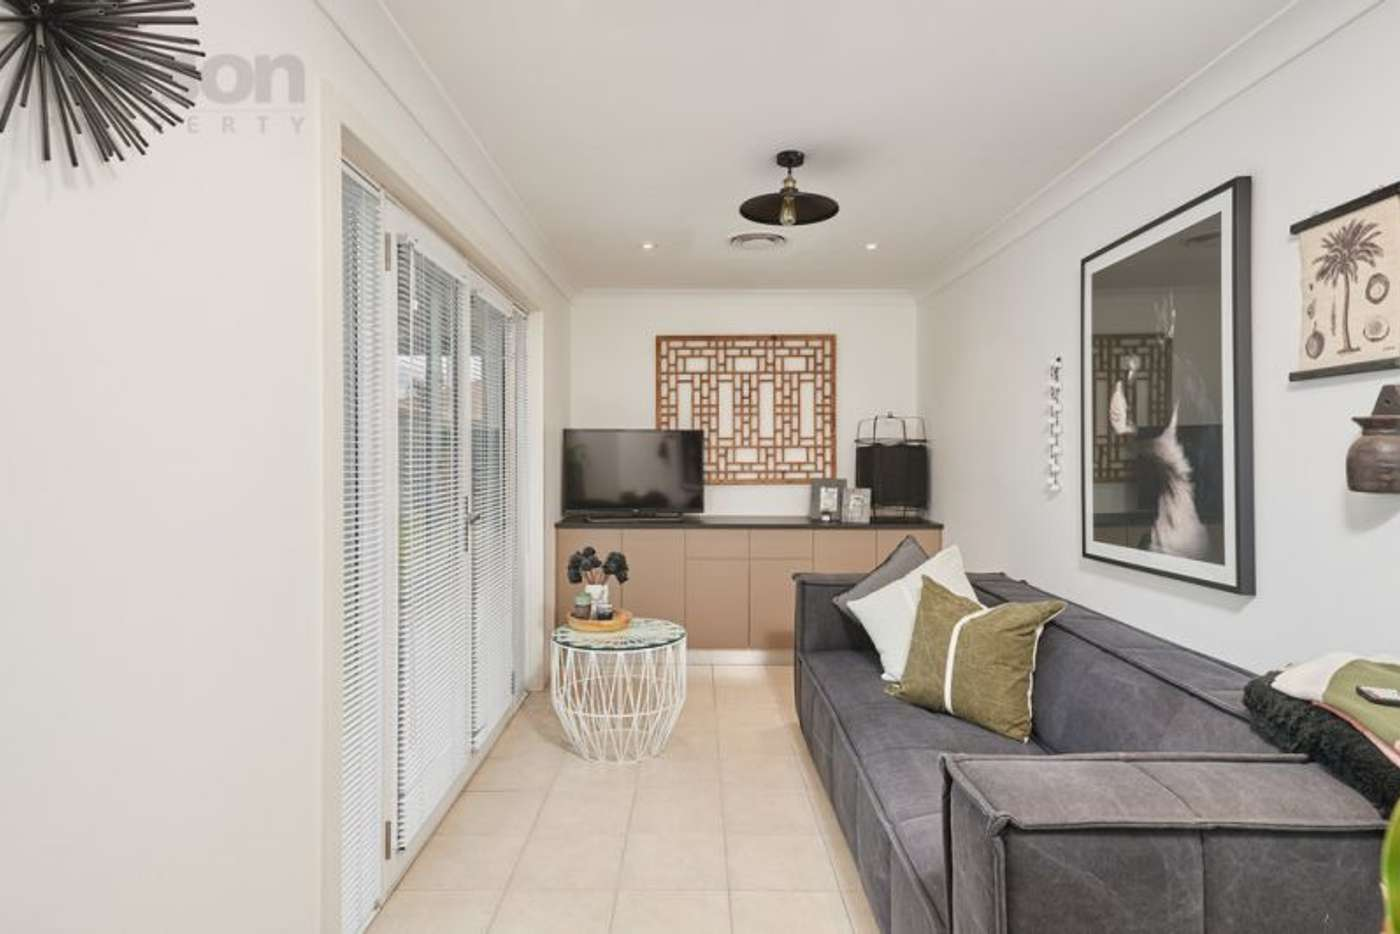 Sixth view of Homely house listing, 19 Wiradjuri Crescent, Wagga Wagga NSW 2650